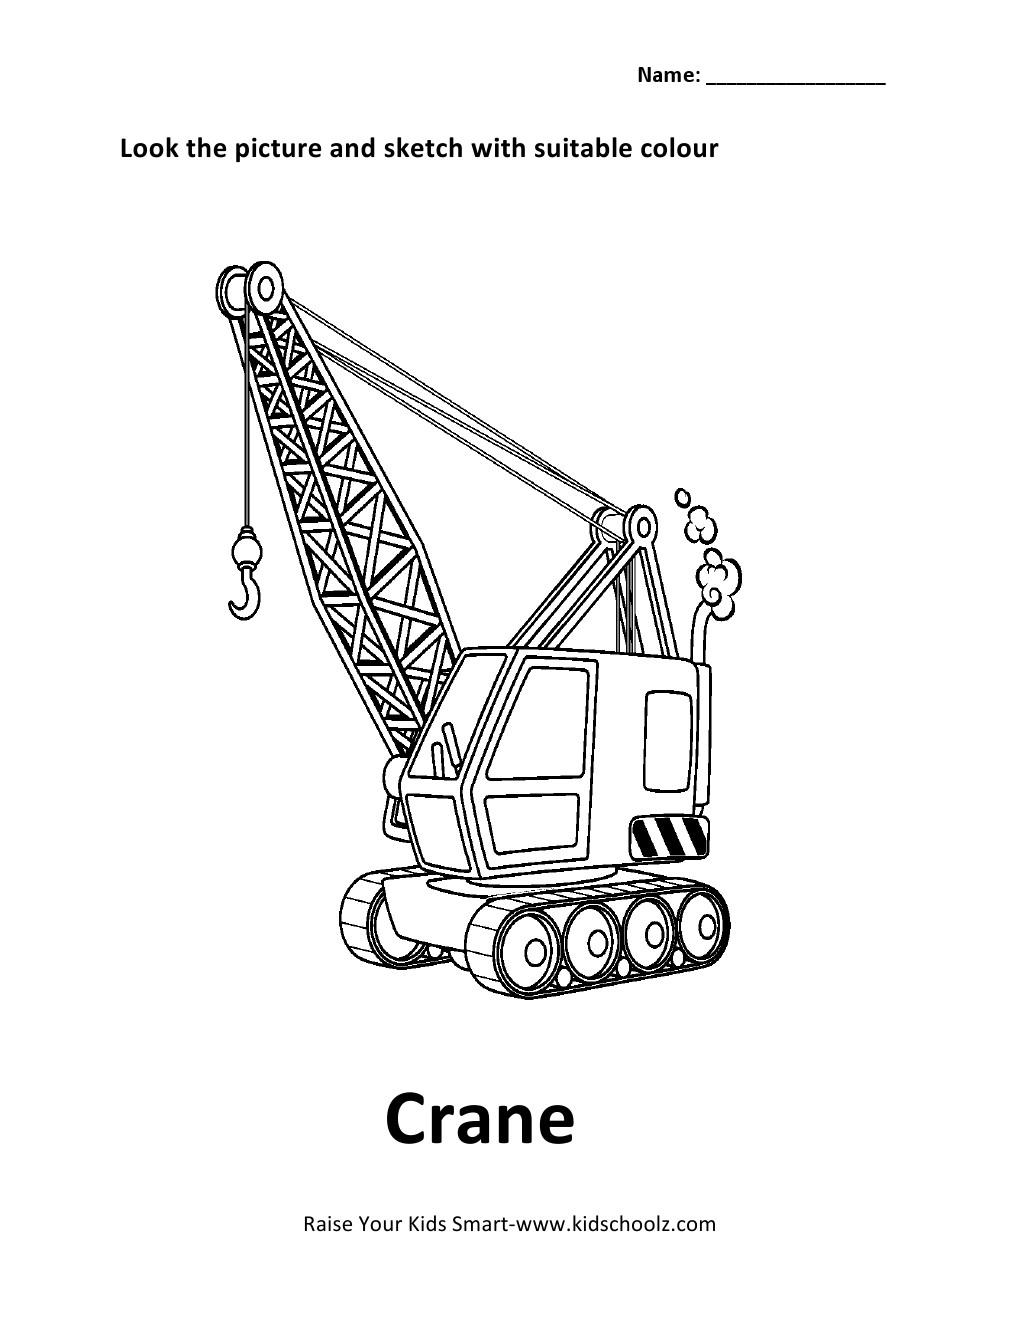 cranky crane coloring pages - photo#7